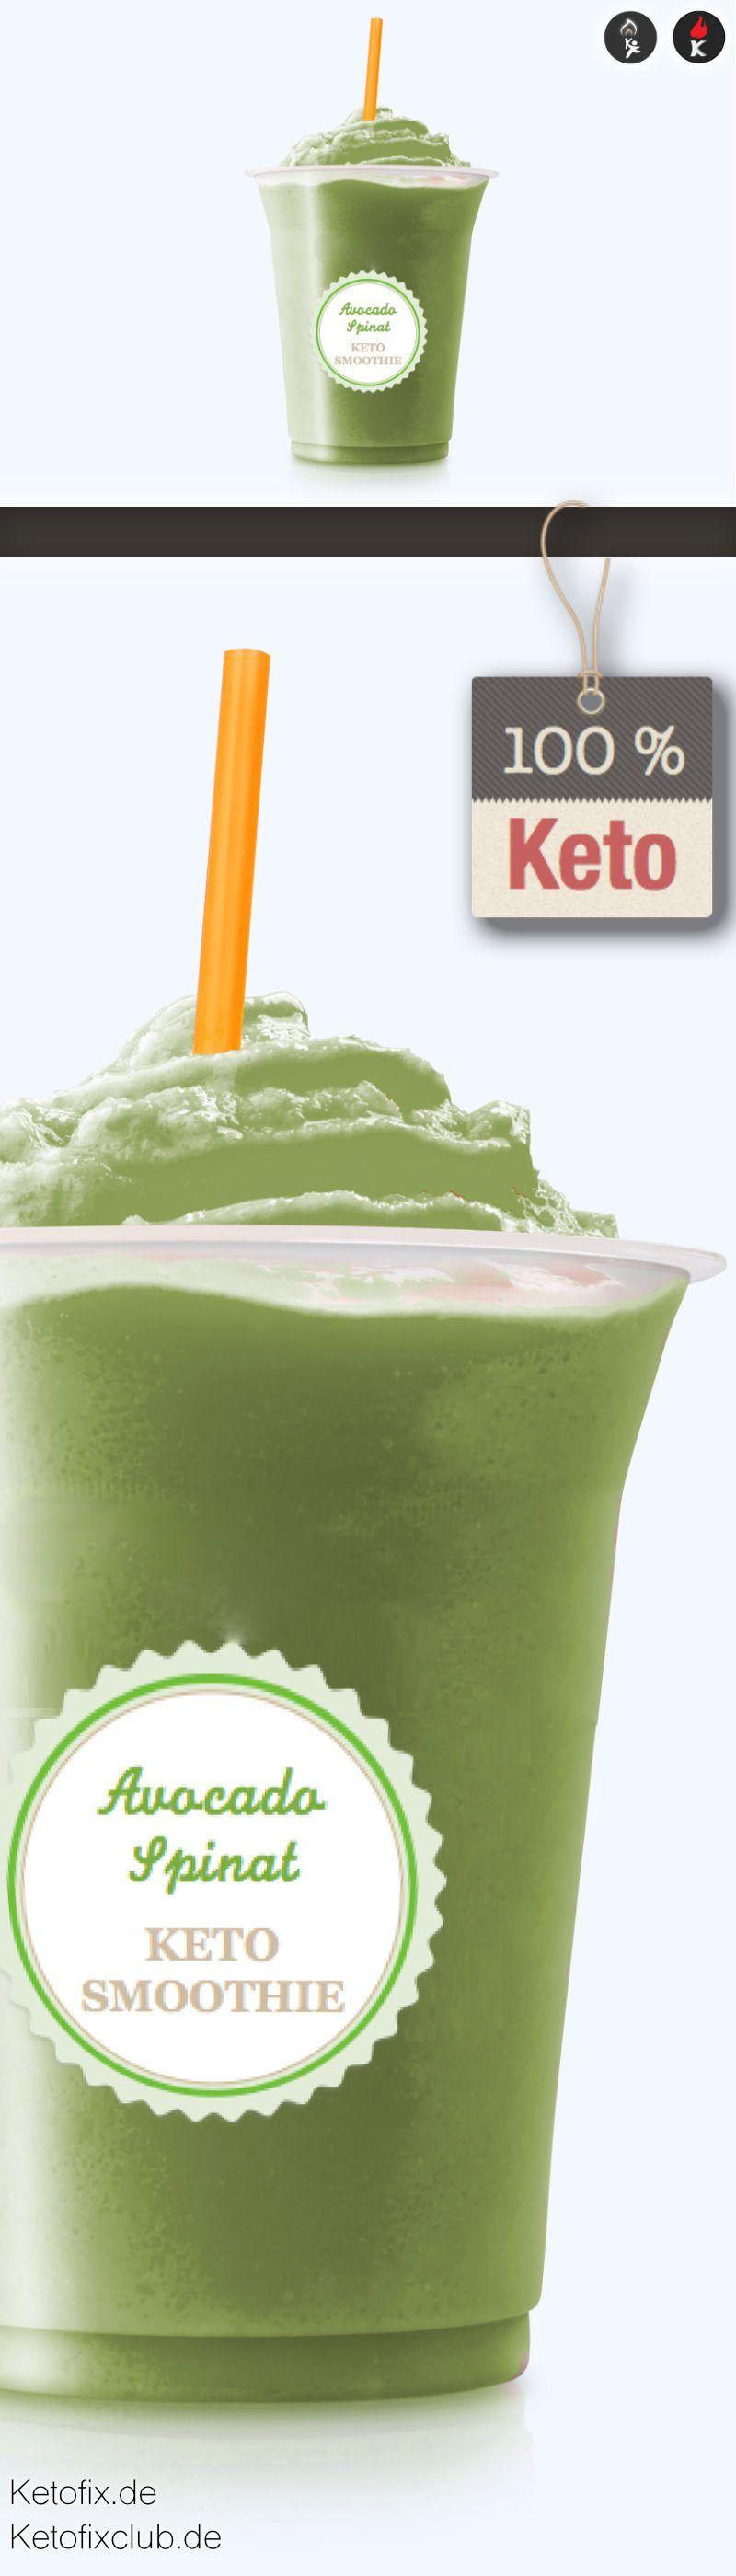 avocado spinat keto smoothie mit moringa rezept keto. Black Bedroom Furniture Sets. Home Design Ideas